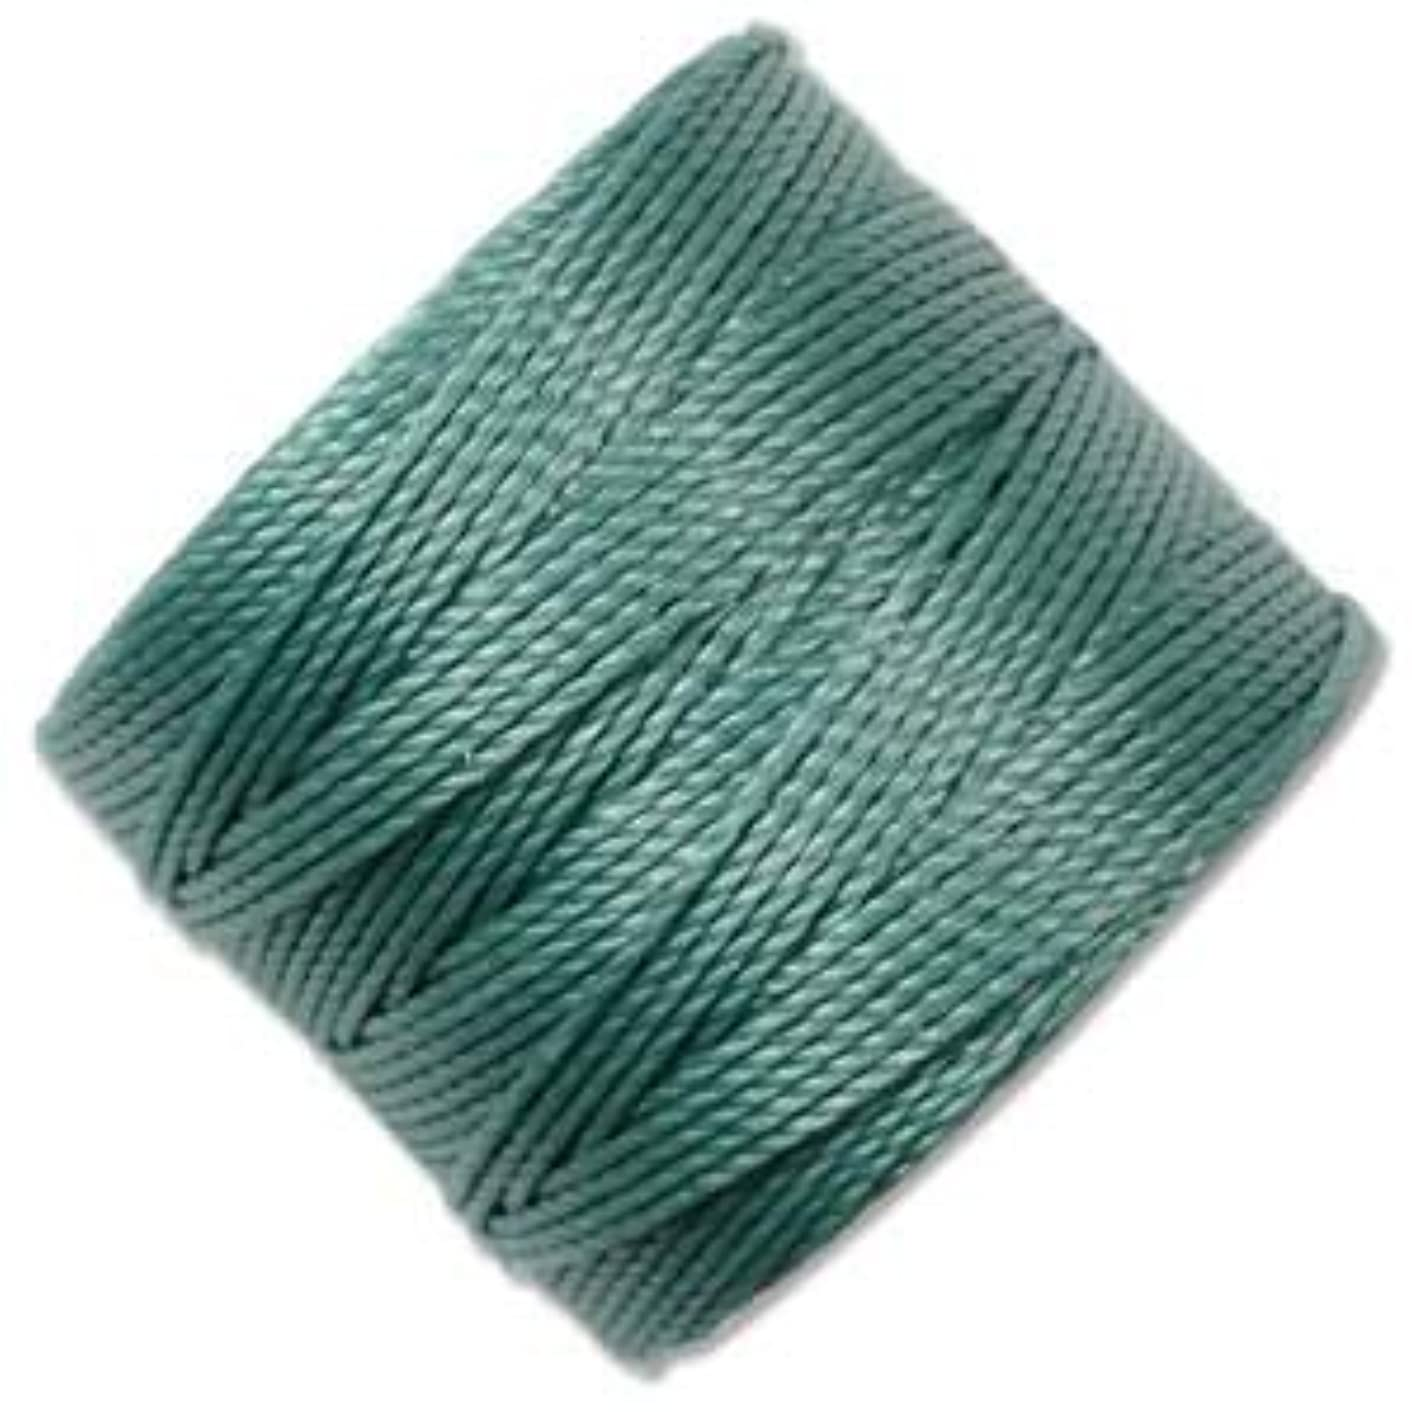 S-Lon Superlon #18 Twisted Nylon Bead Cord 77 Yard Spool Bobbin VINTAGE JADE